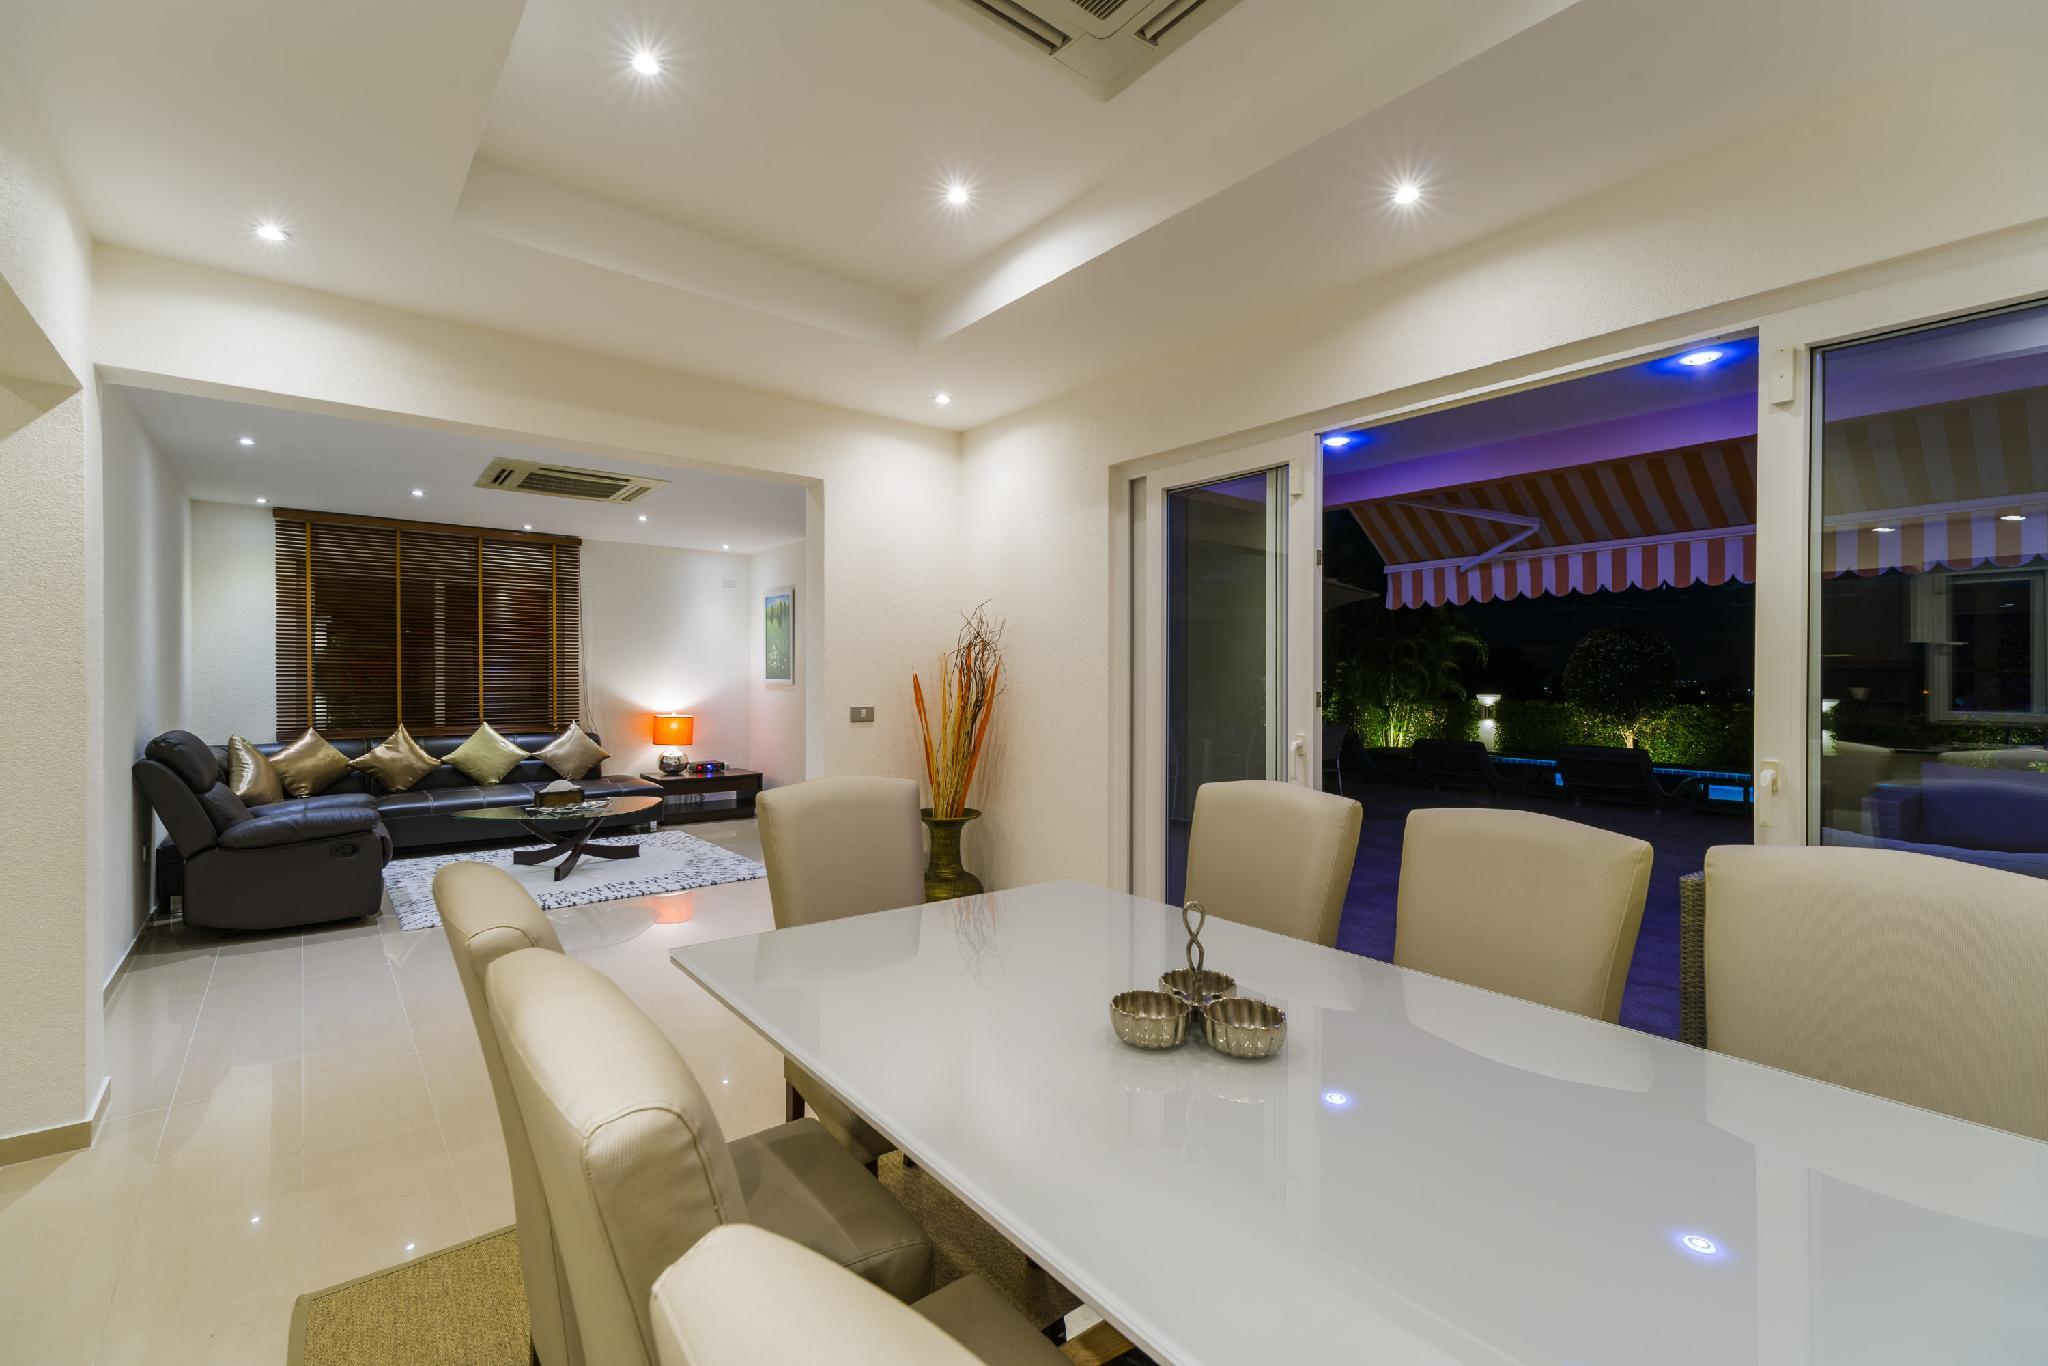 Price Luxury Pool Villa 604 / 4 BR 8-10 Persons